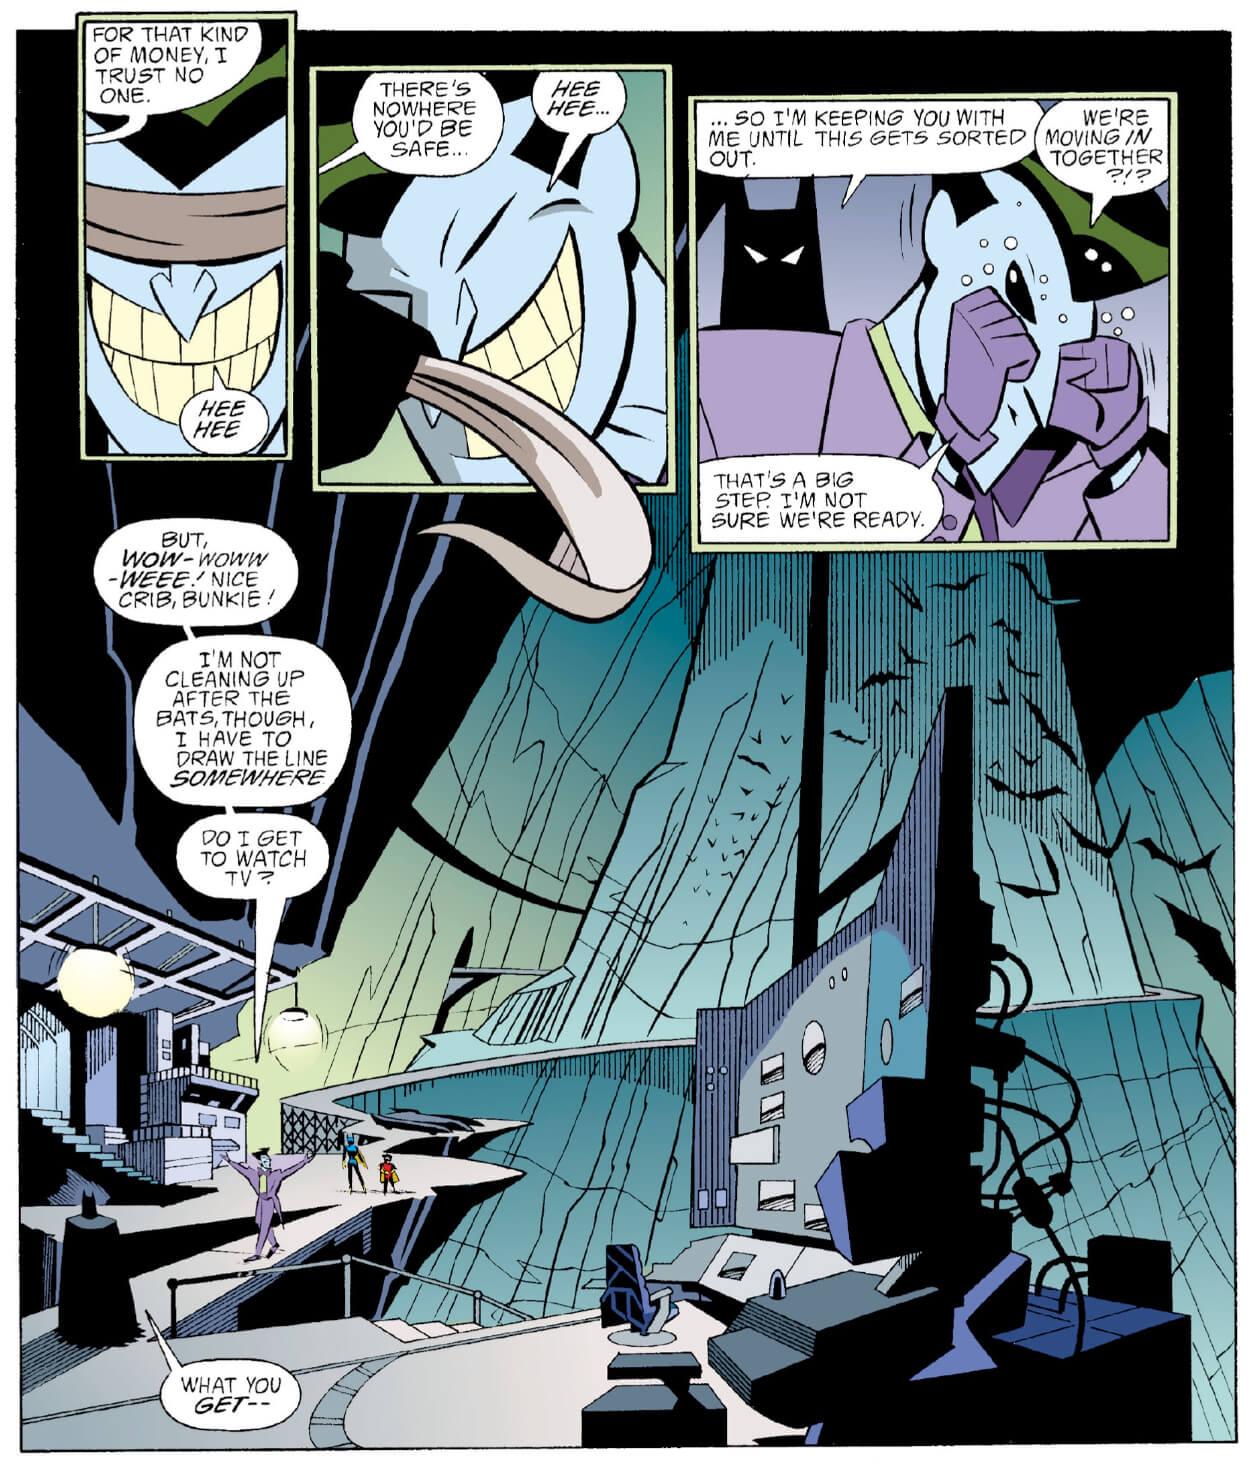 batman-adventures-joker-batcave.JPG